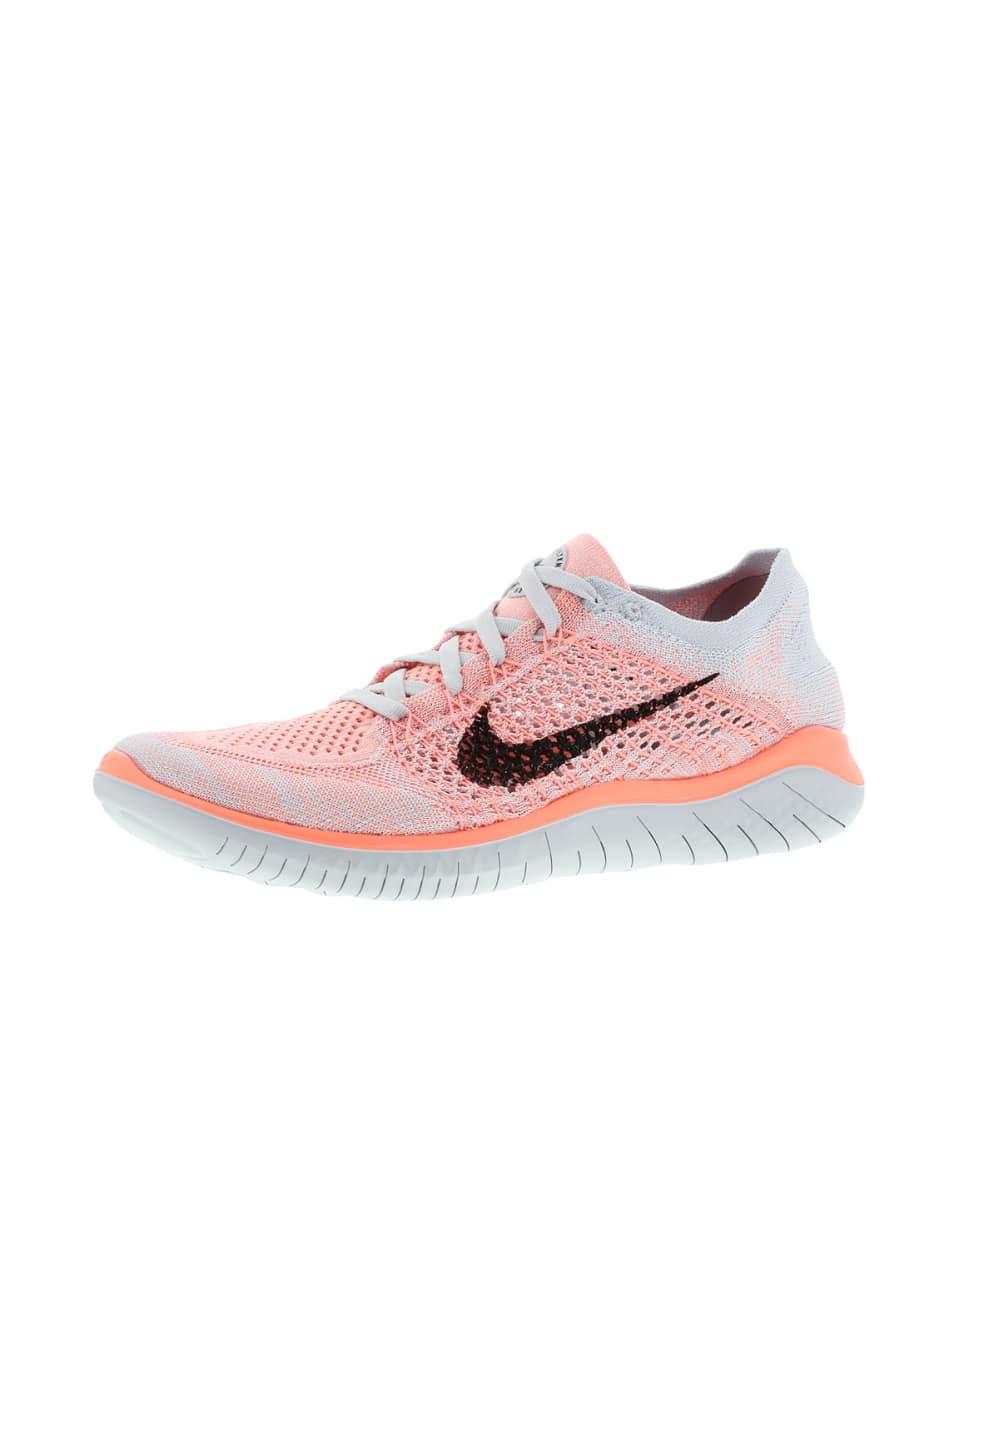 Nike Free RN Flyknit 2018 - Laufschuhe für Damen - Pink